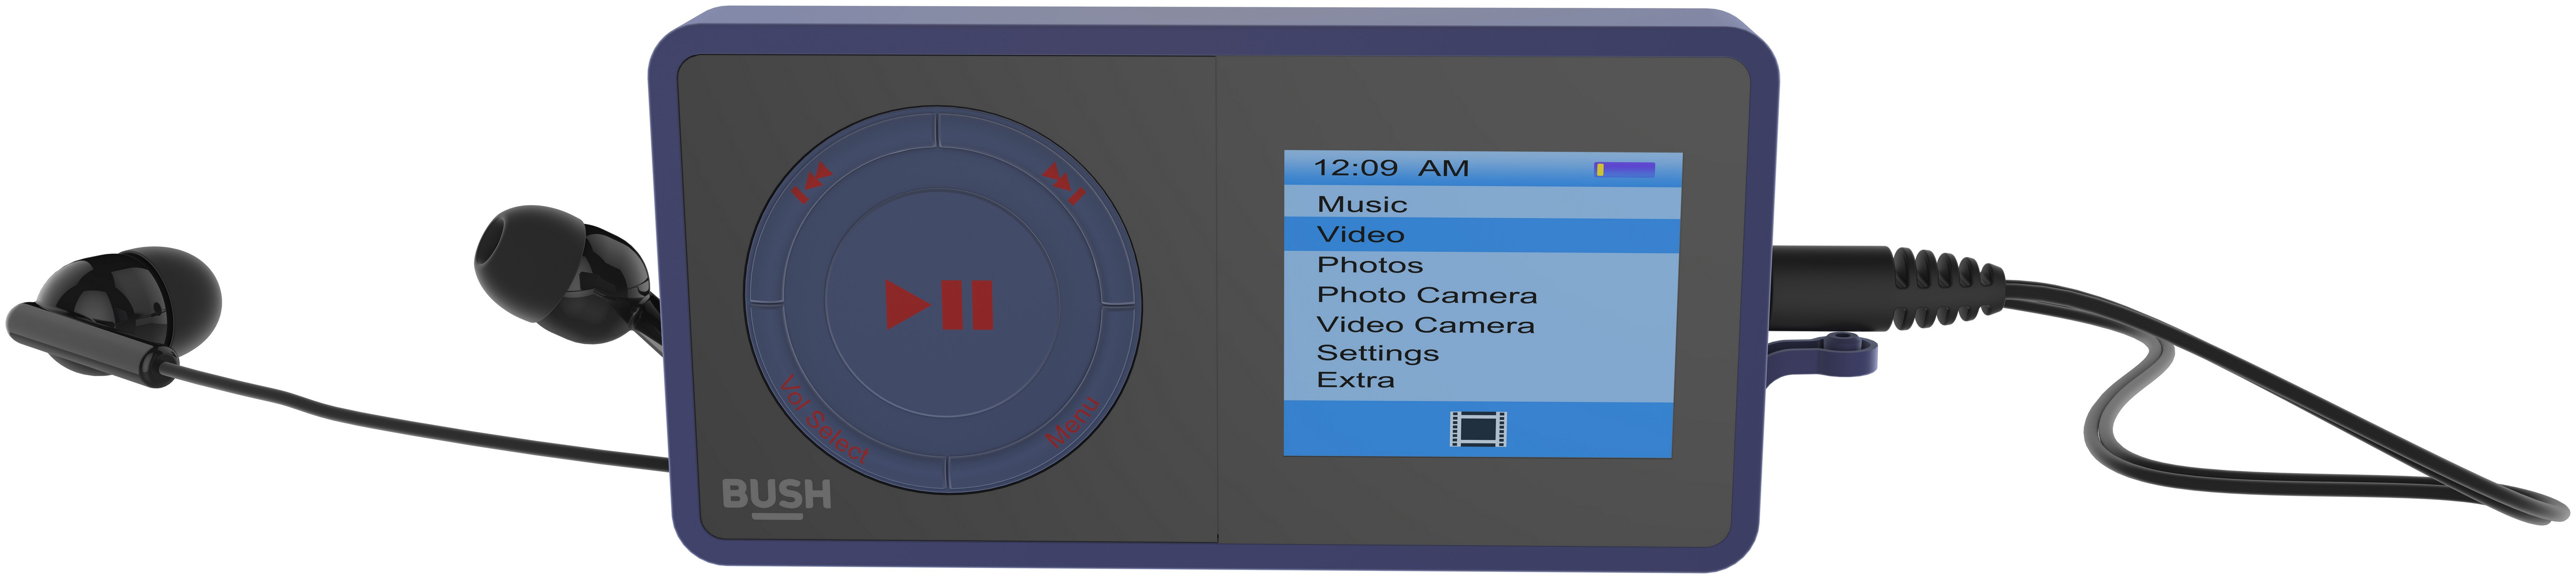 Bush 8GB MP3 Player - Blue